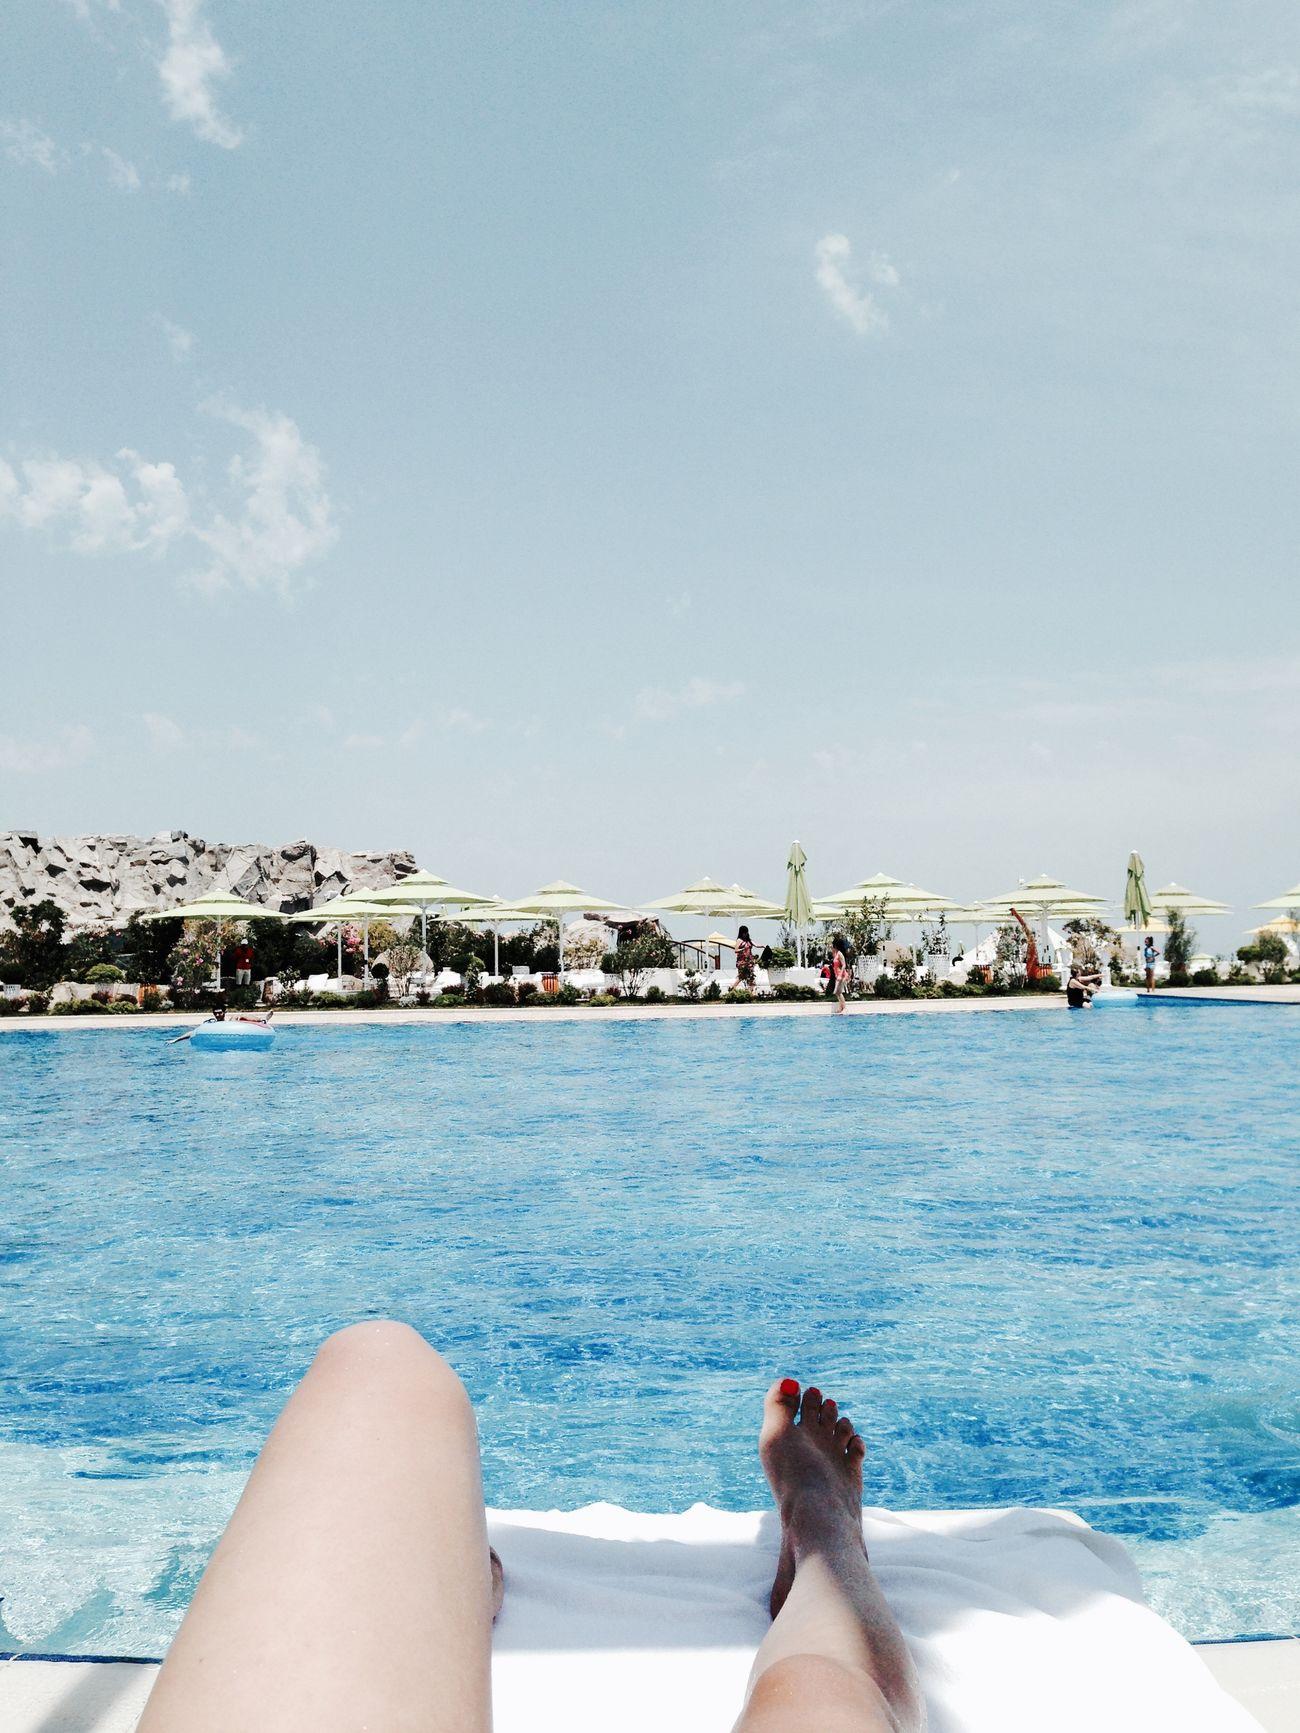 Quality Time Enjoying Life Relaxing Hello World Sunshine Enjoying The Sun Vacation Around Azerbaijan I Don't Care, I Love It ☀️🙋🏽🏊🏽😎🌞